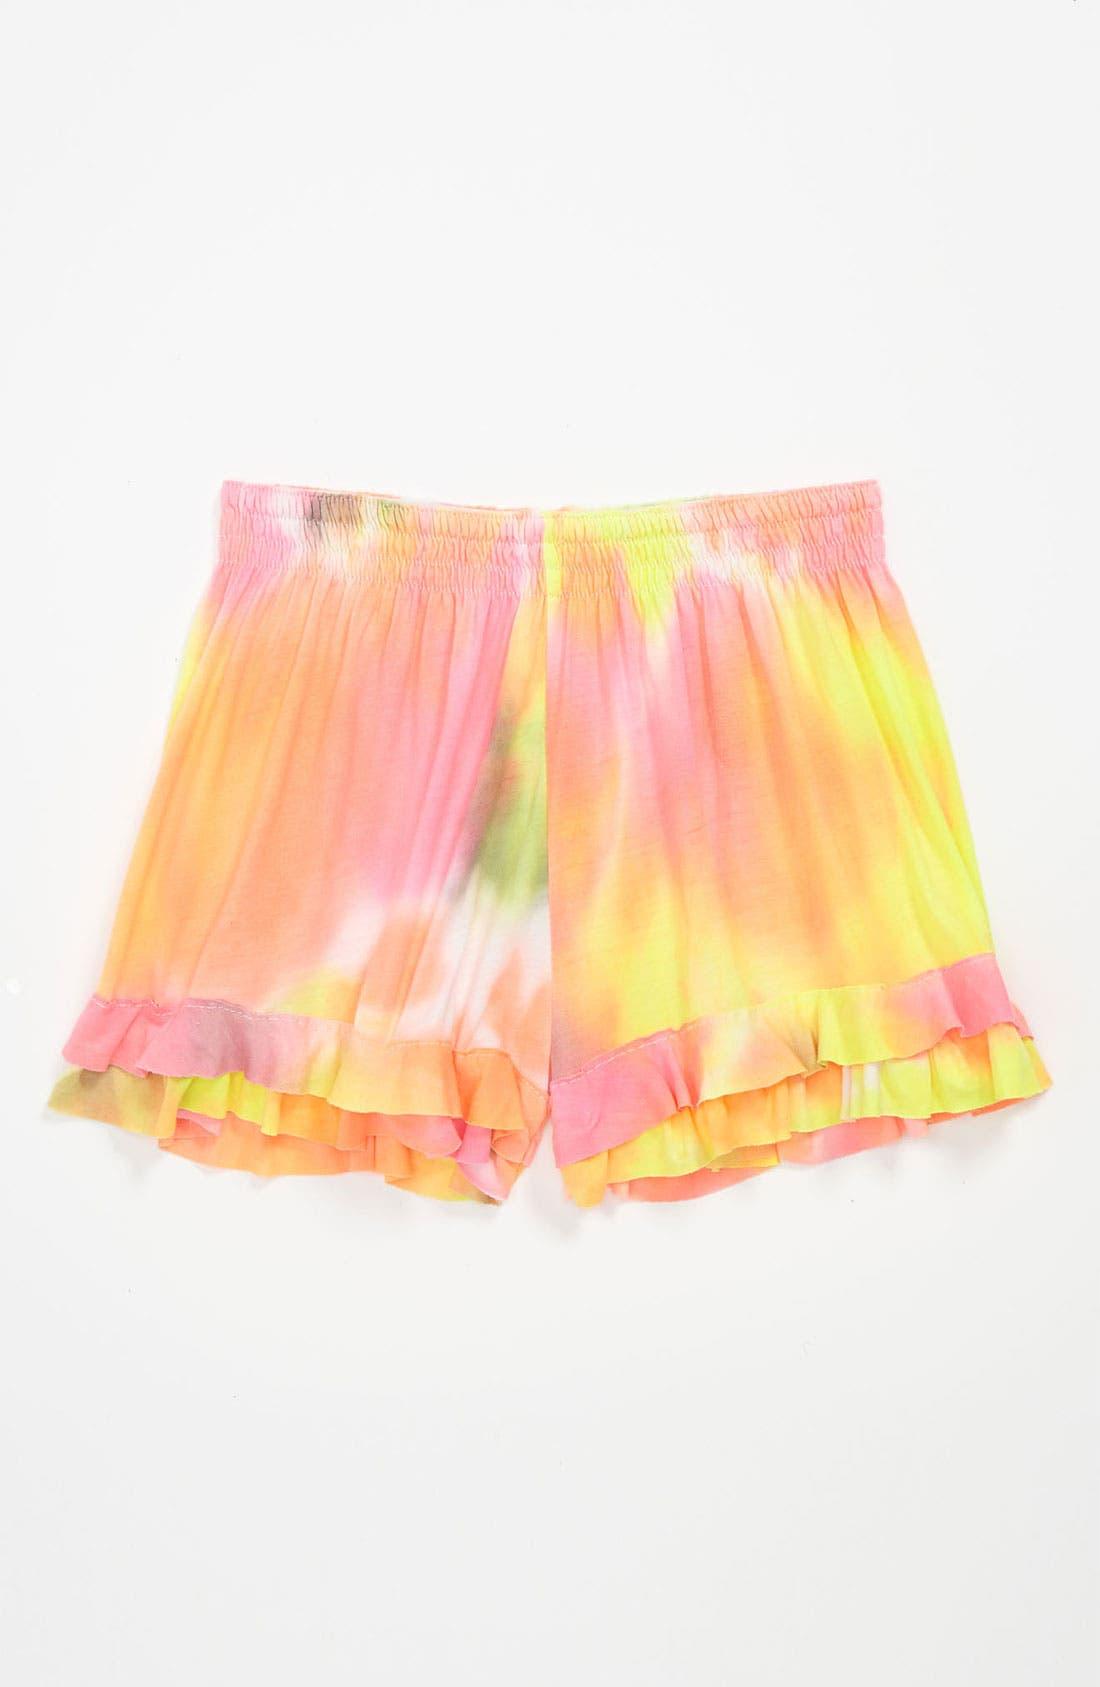 Alternate Image 1 Selected - Flowers by Zoe Ruffle Shorts (Little Girls)